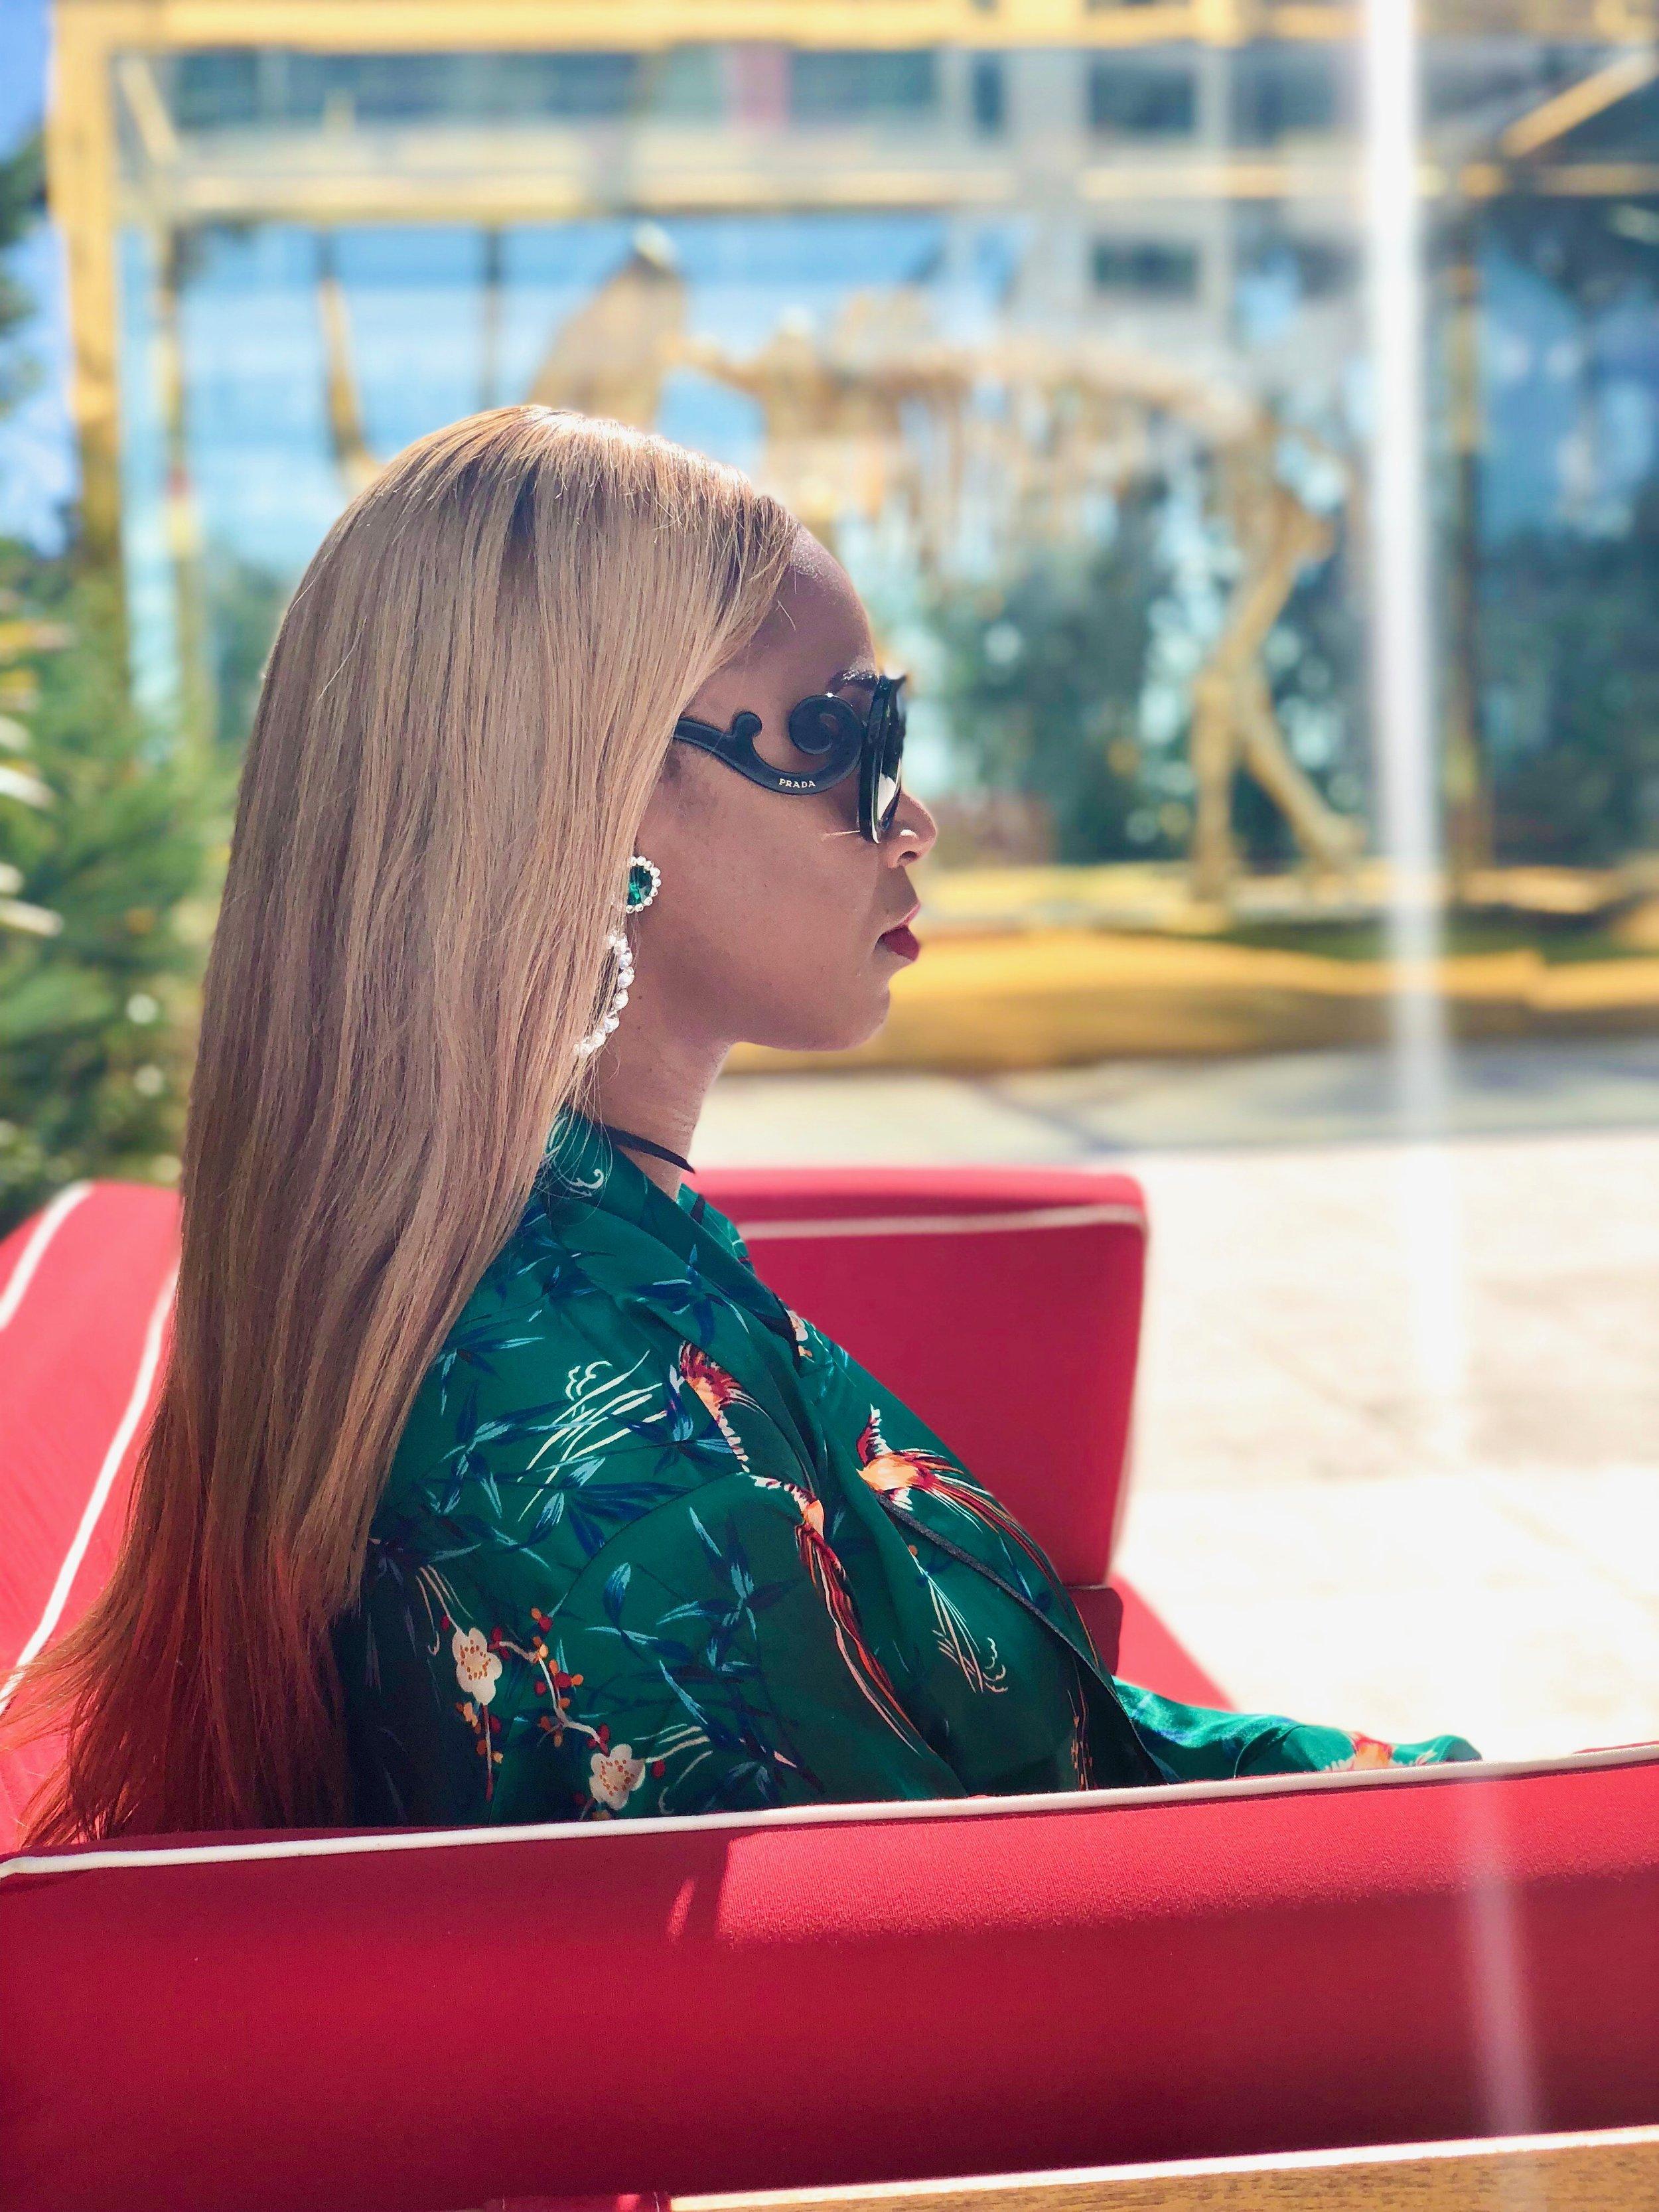 Location: Faena  Kimono: Forever 21  Sunglasses: Prada  Earrings: Aldo Accessories